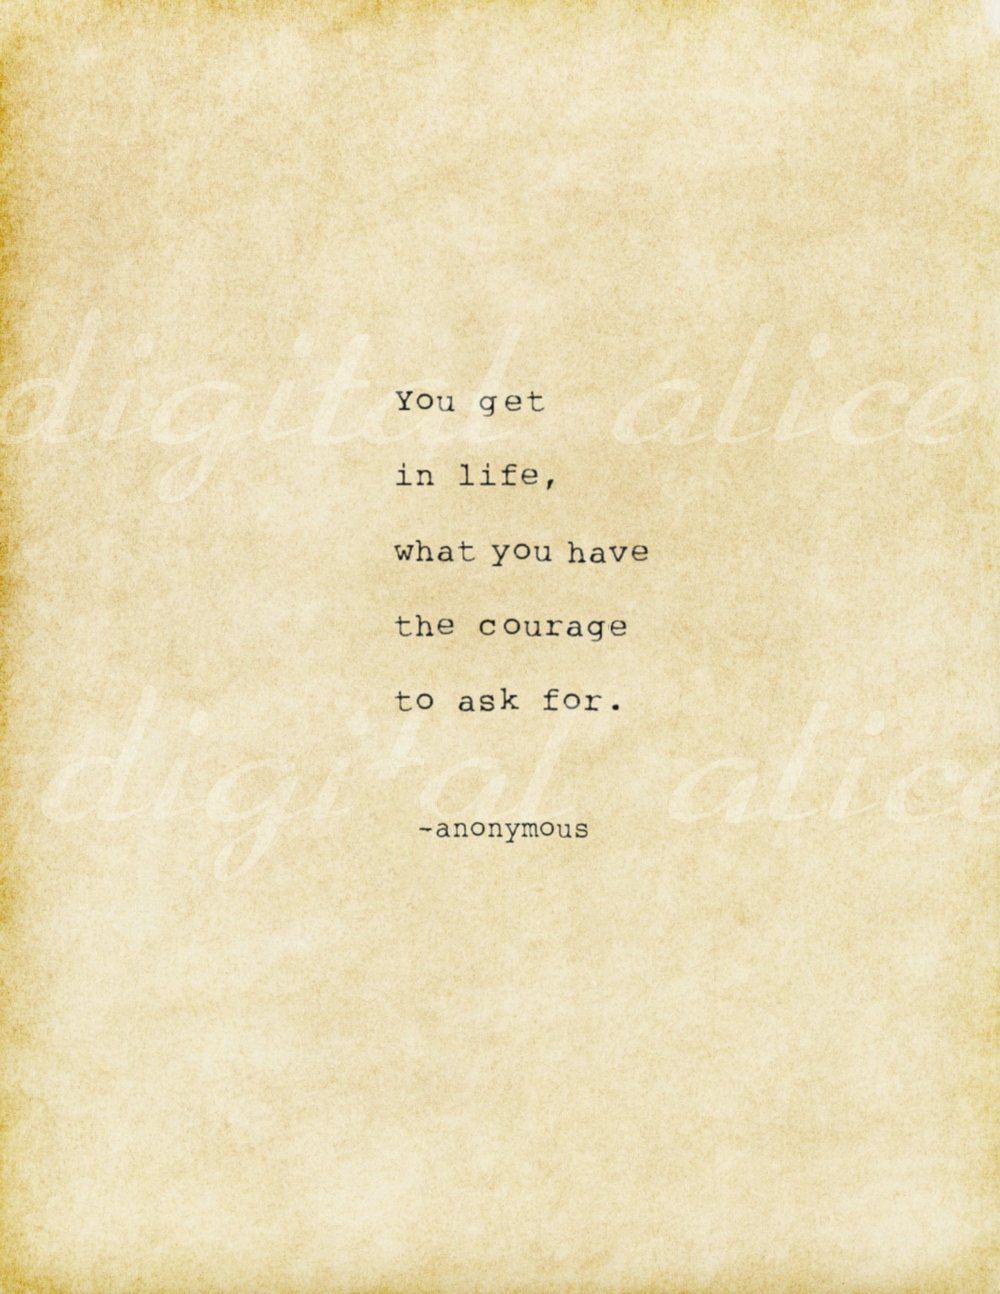 VINTAGE TYPEWRITER PRINT Digital Life Quote You get in life | Etsy